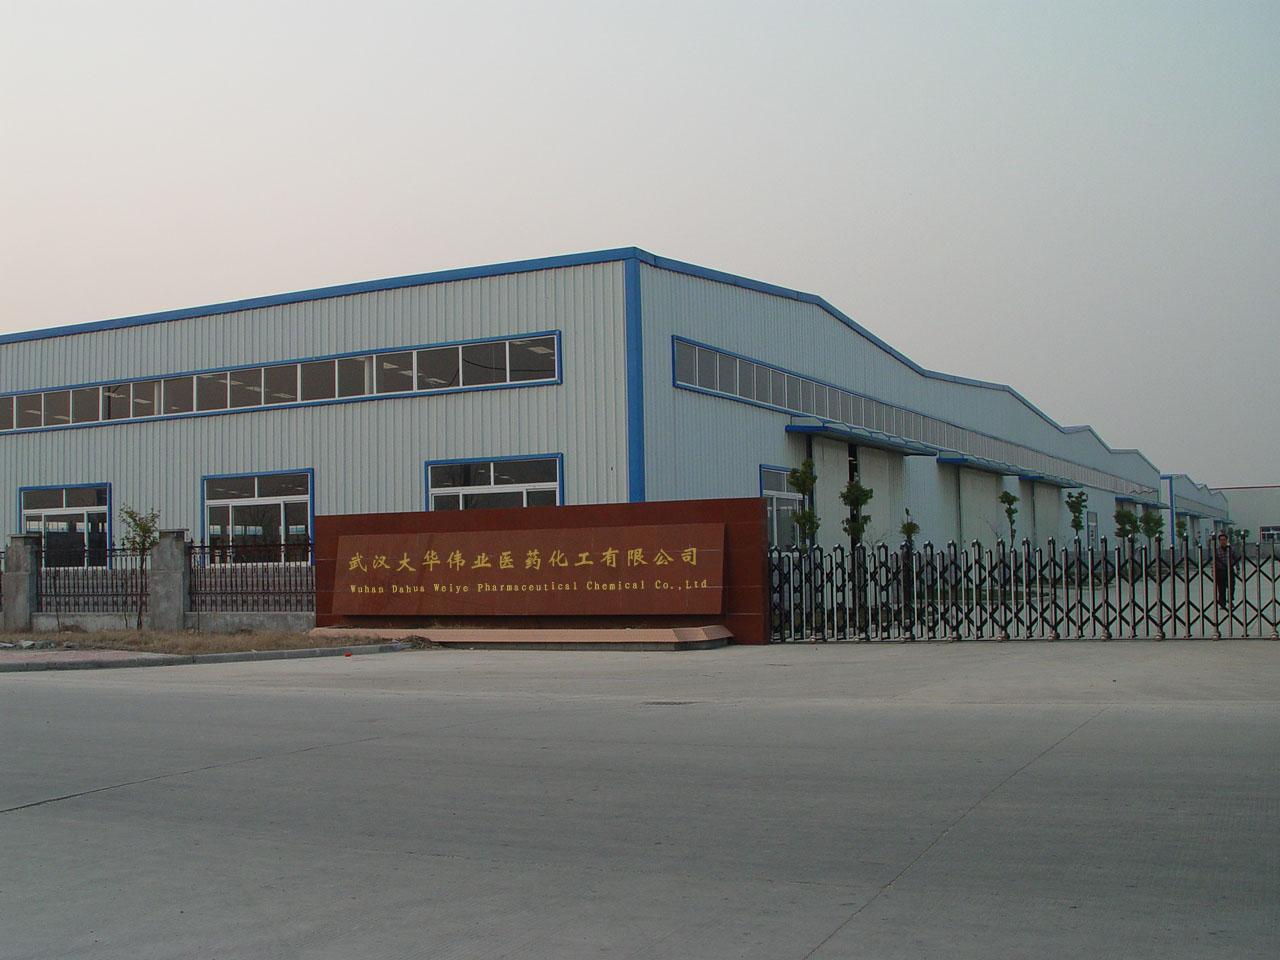 Wuhan Dahua Weiye Pharmaceutical Chemical Co., Ltd.